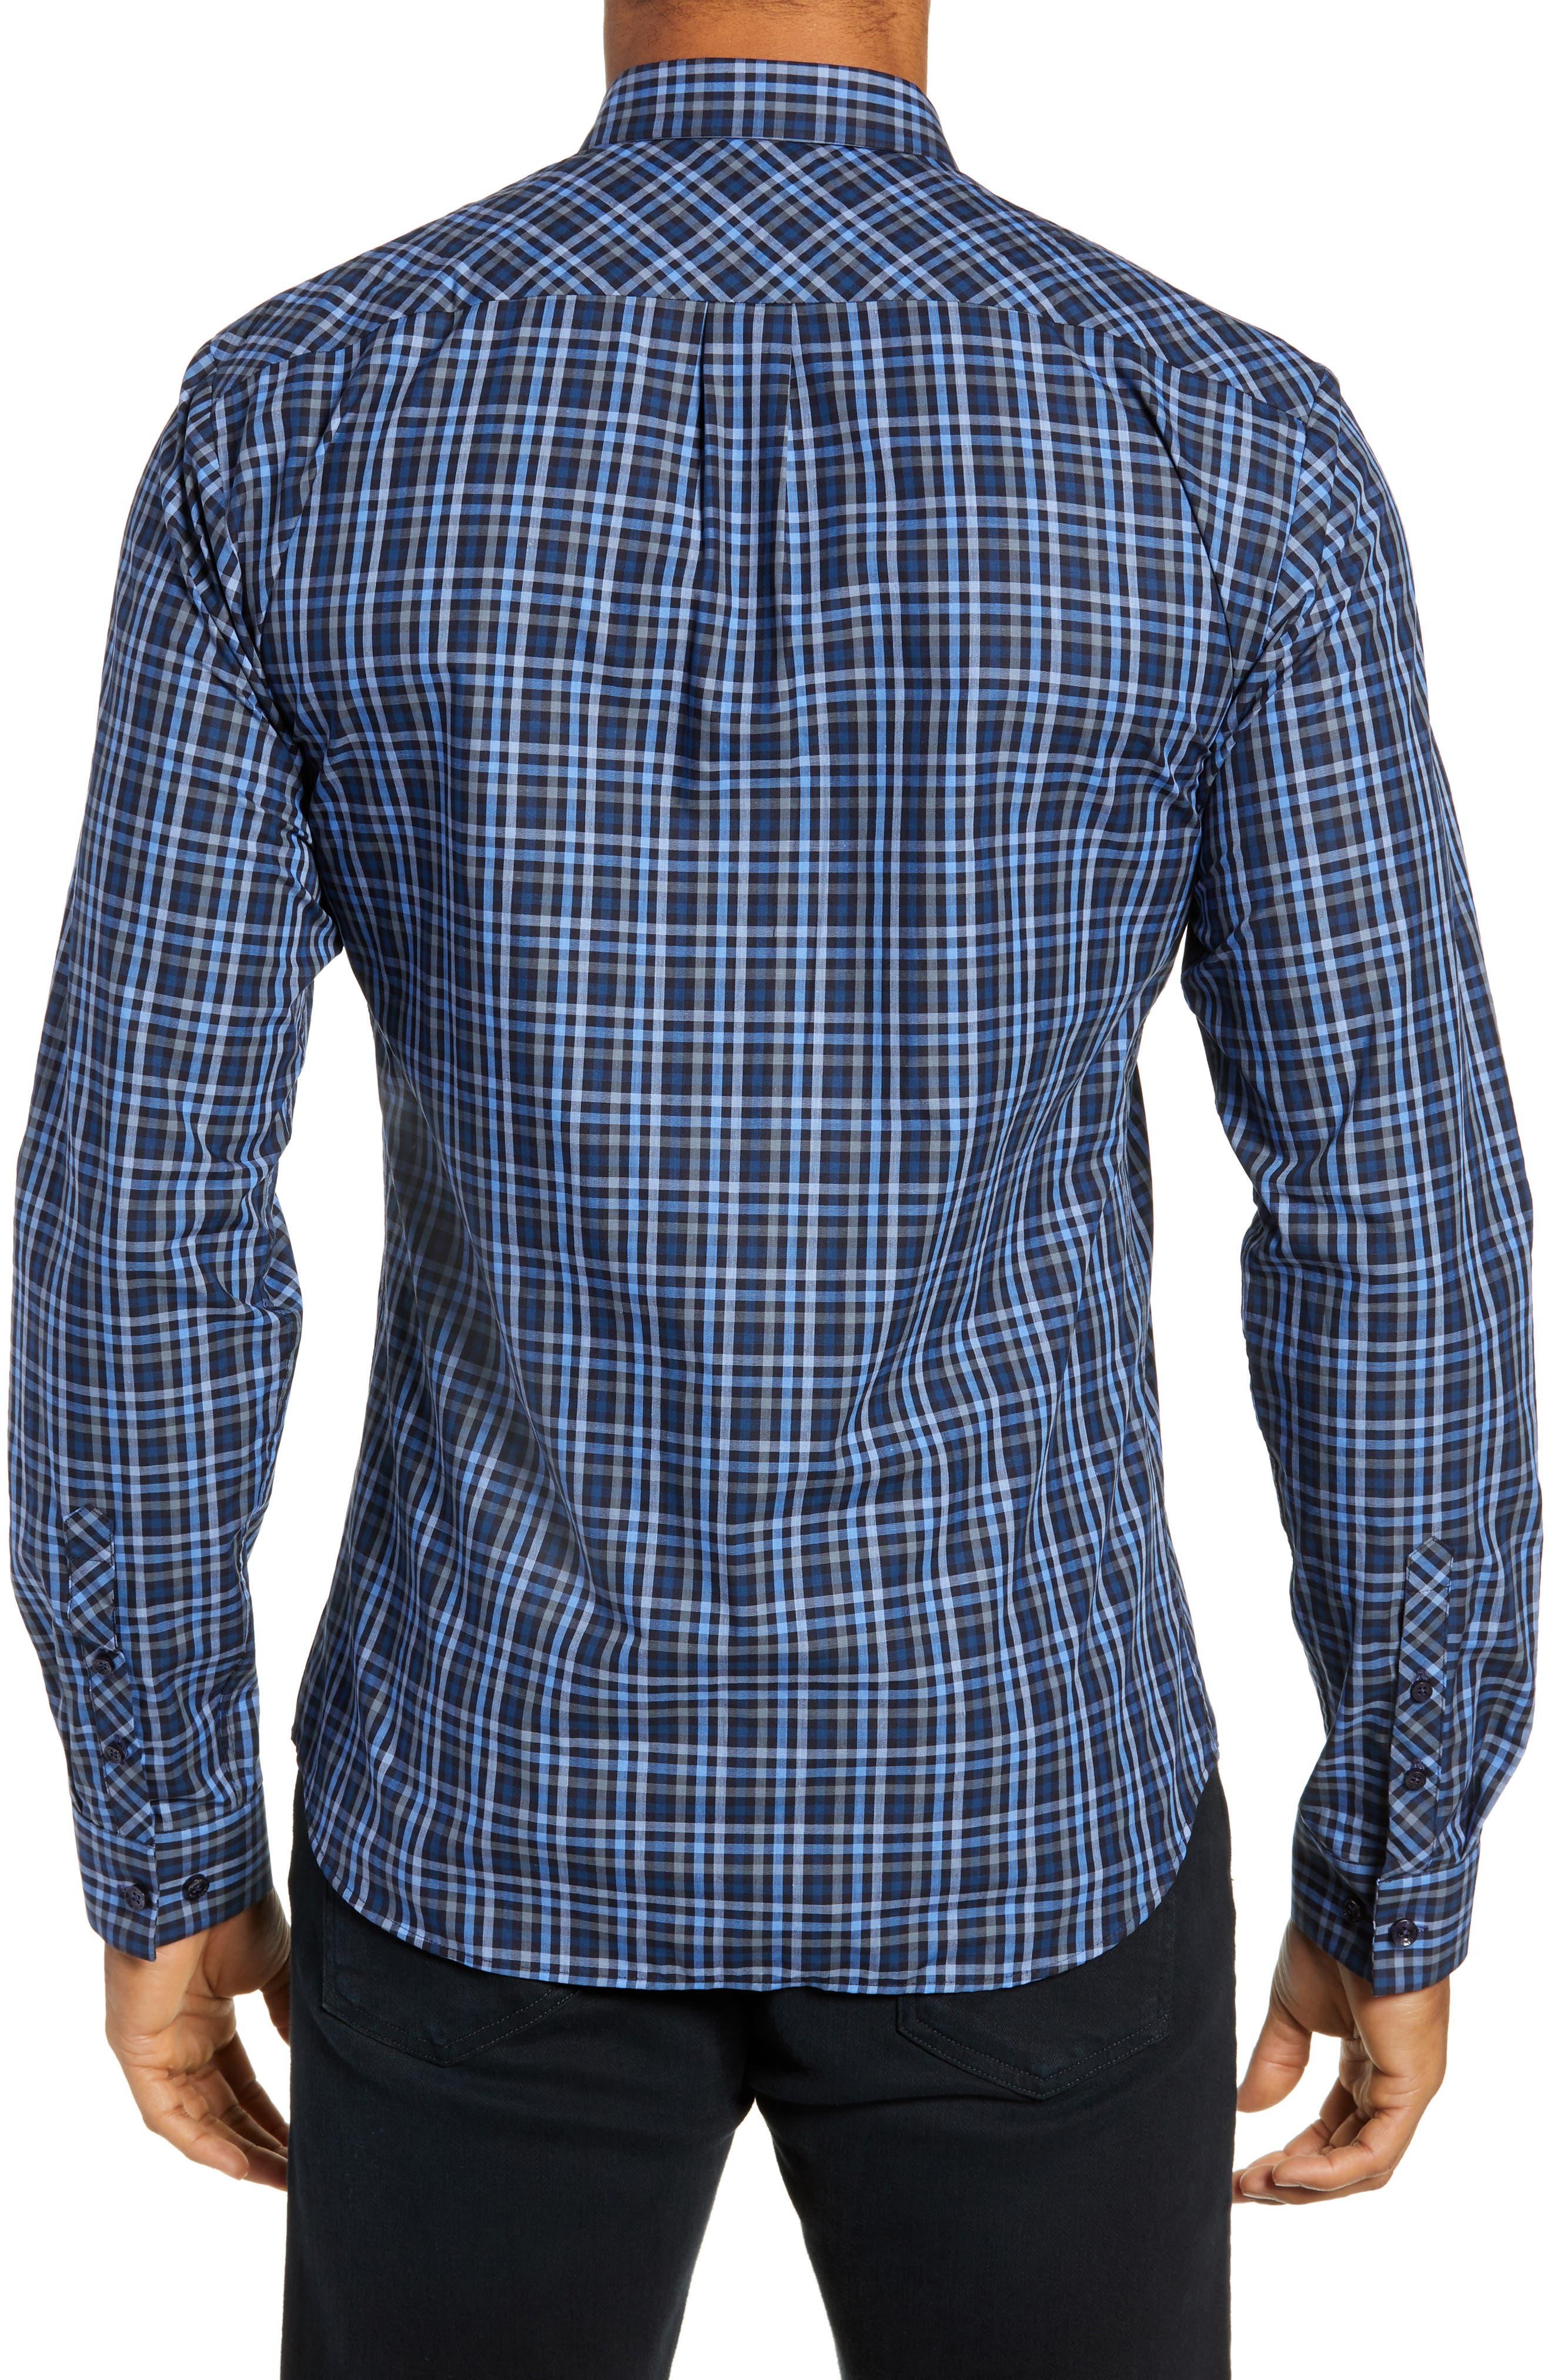 Trim Fit Sport Shirt,                             Alternate thumbnail 3, color,                             NAVY - BLUE MULTI CHECK